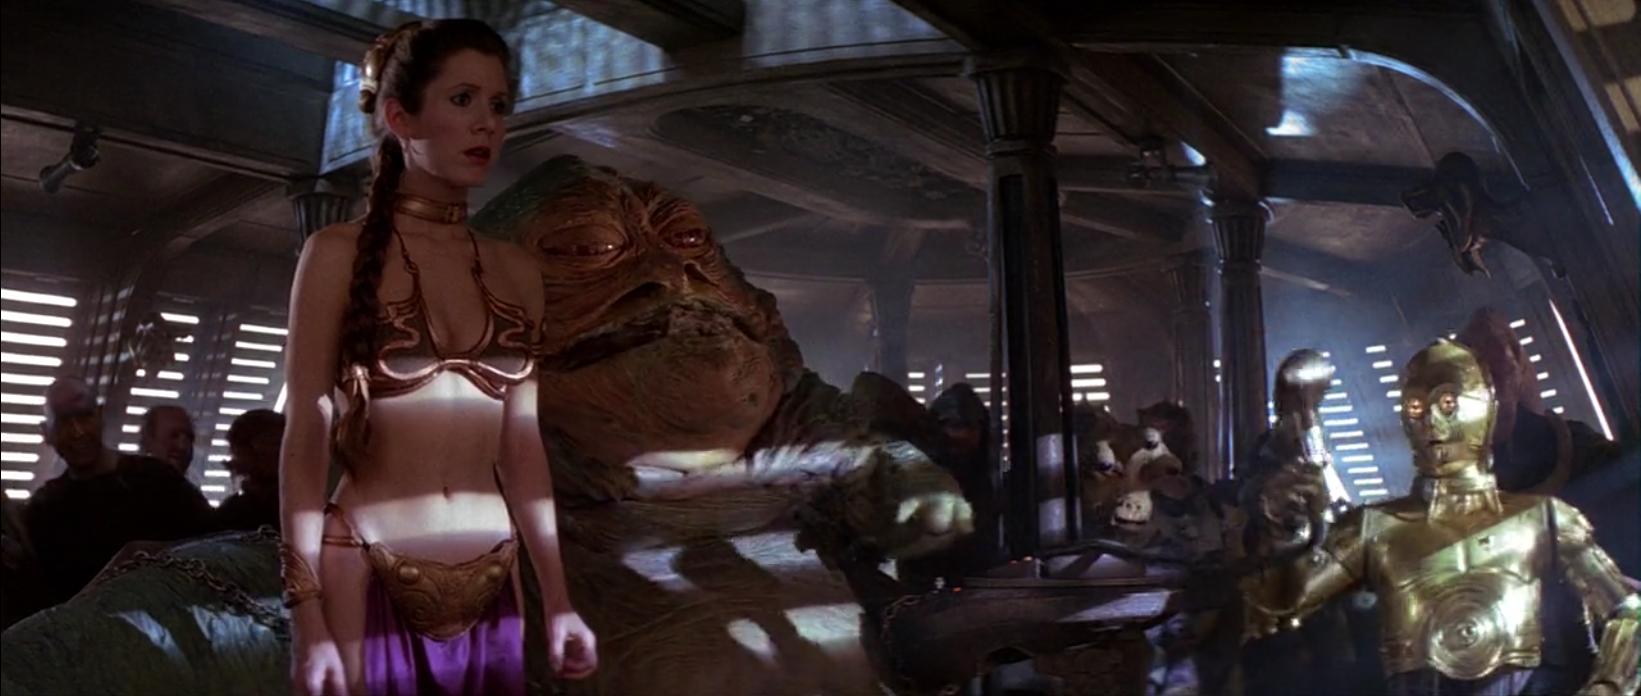 Carrie Fisher as Princess Leia in a metal bikini  - George Lucas sells LucasFilm for 4 Billion!